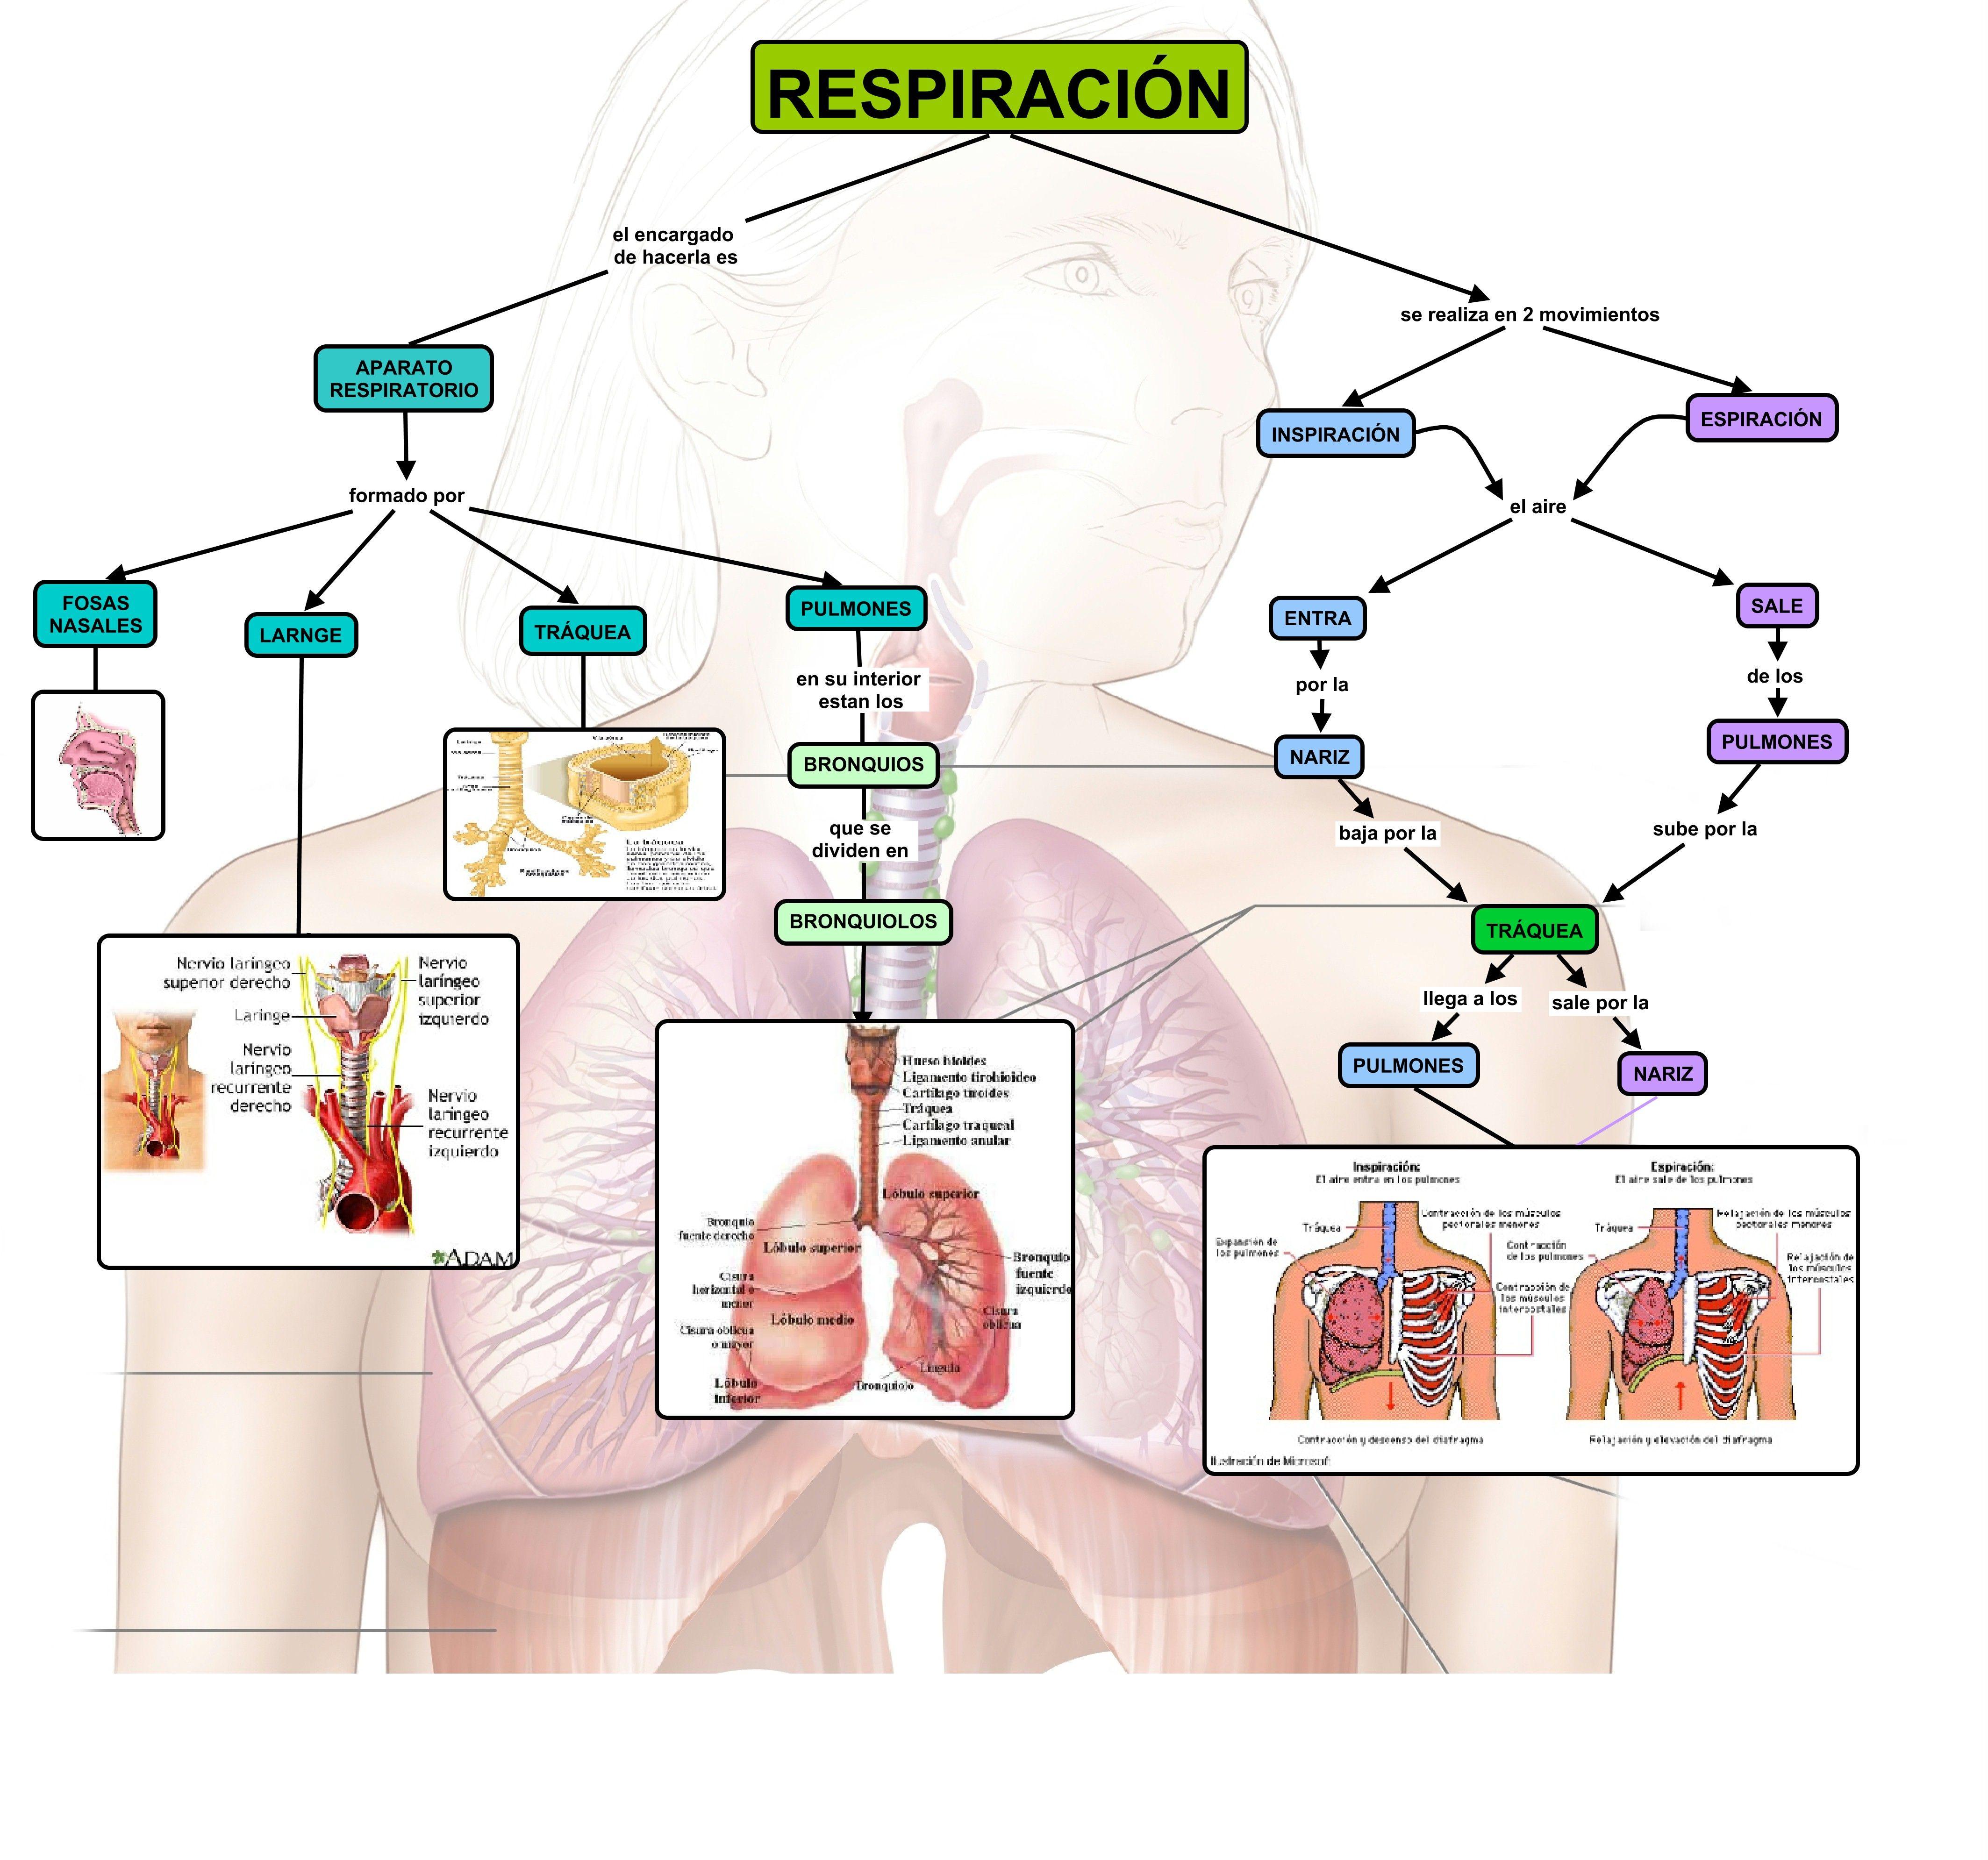 Cuadros Sinópticos Sobre El Aparato Respiratorio Humano Intercambio De Gase Aparato Respiratorio Humano Aparato Respiratorio Imagenes Del Aparato Respiratorio